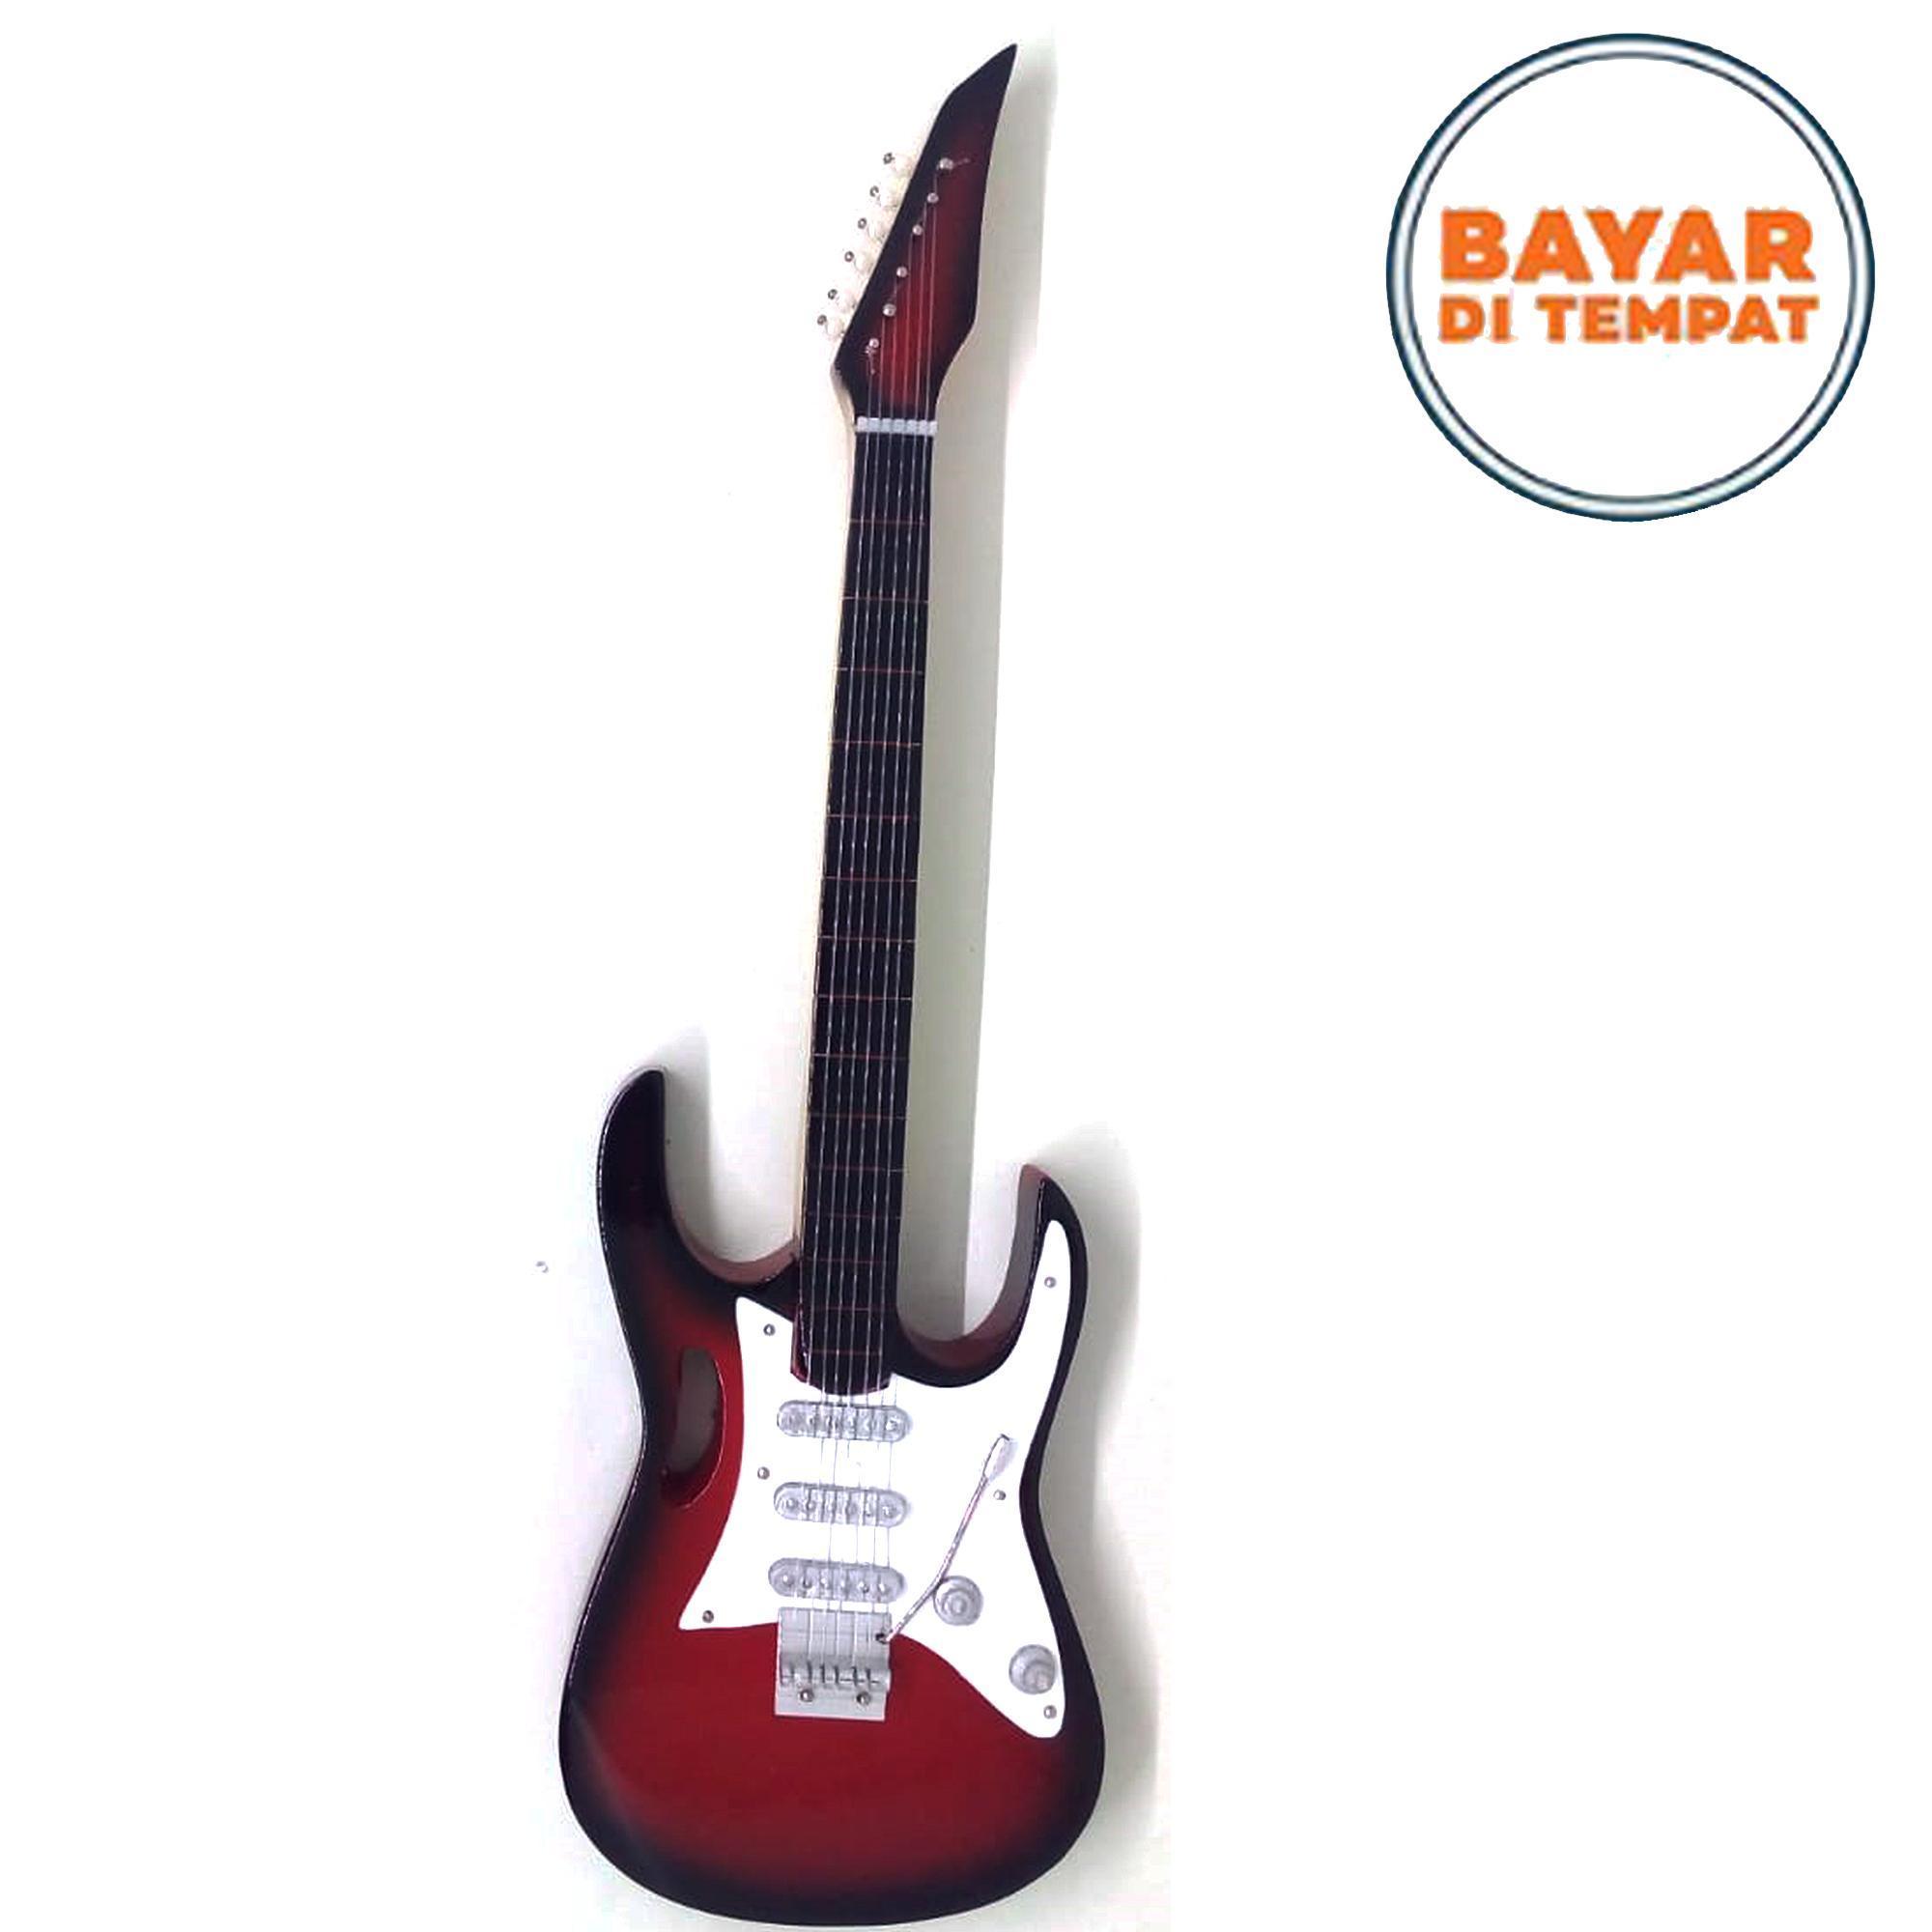 Miniatur Gitar Akusitk Klasik